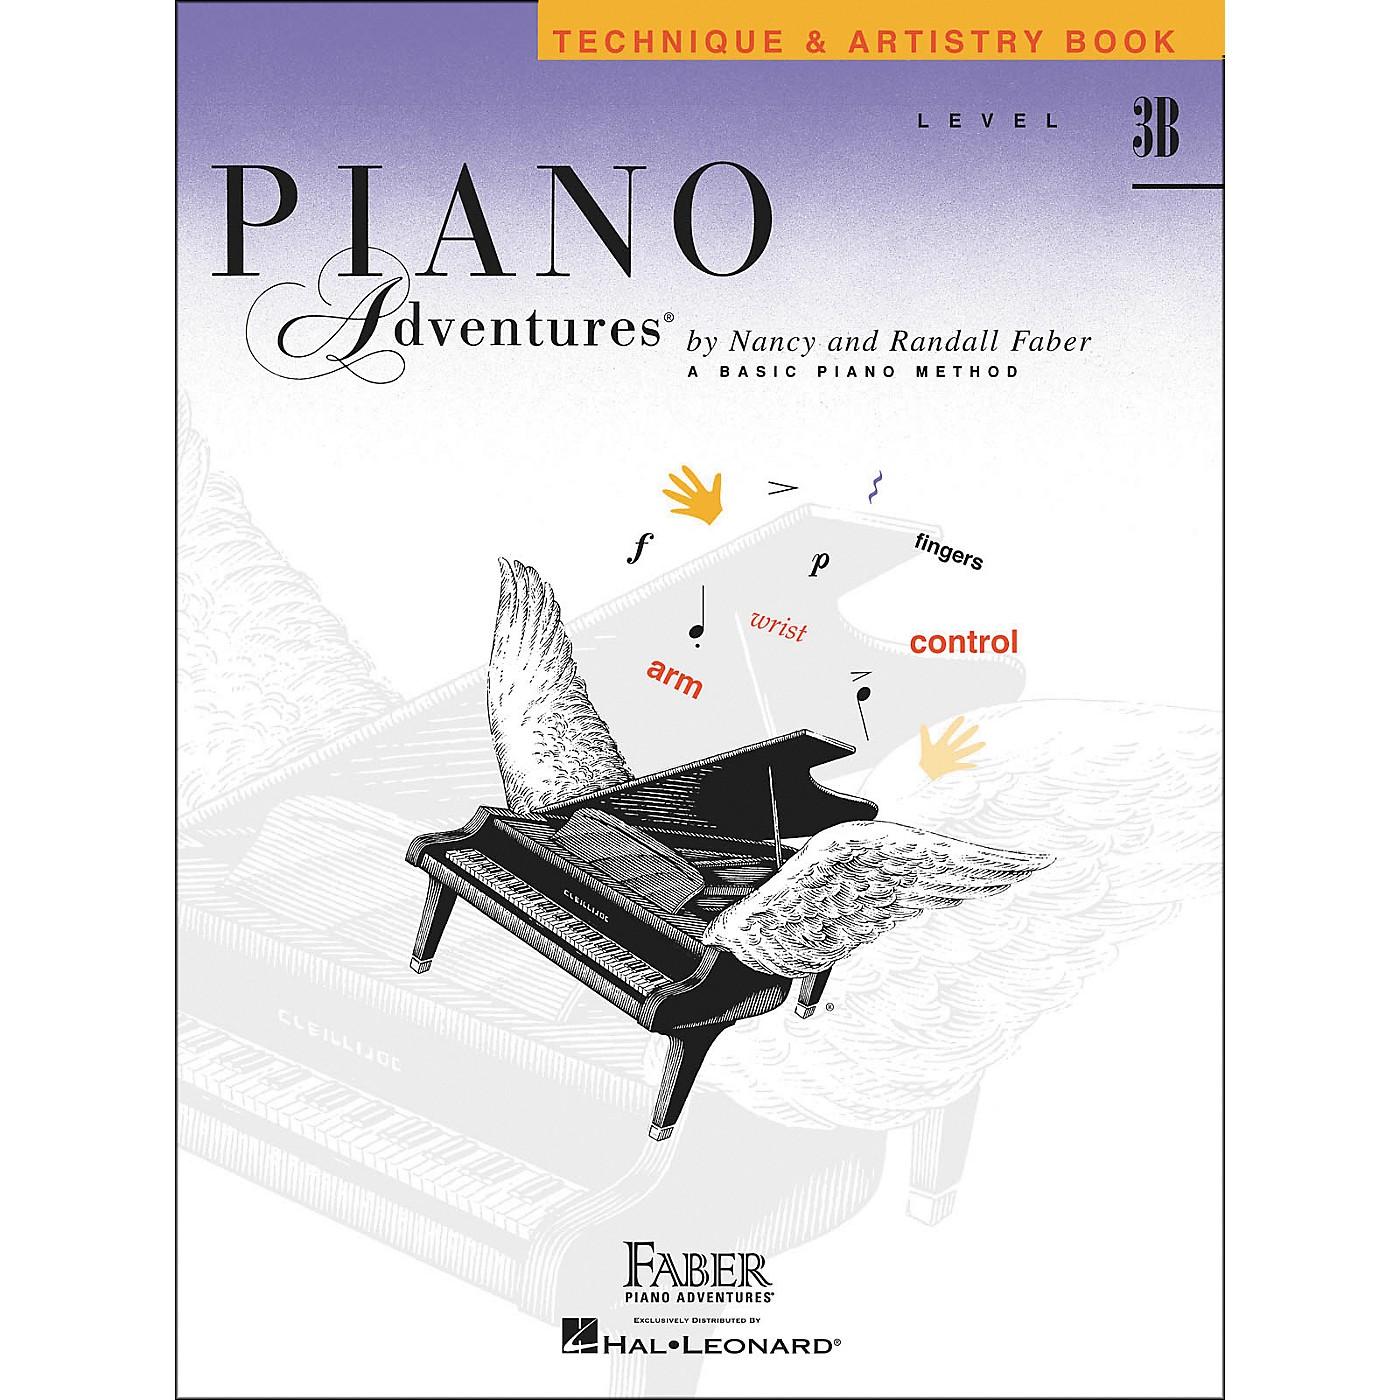 Faber Piano Adventures Piano Adventures Technique & Artistry Book Level 3B - Faber Piano thumbnail